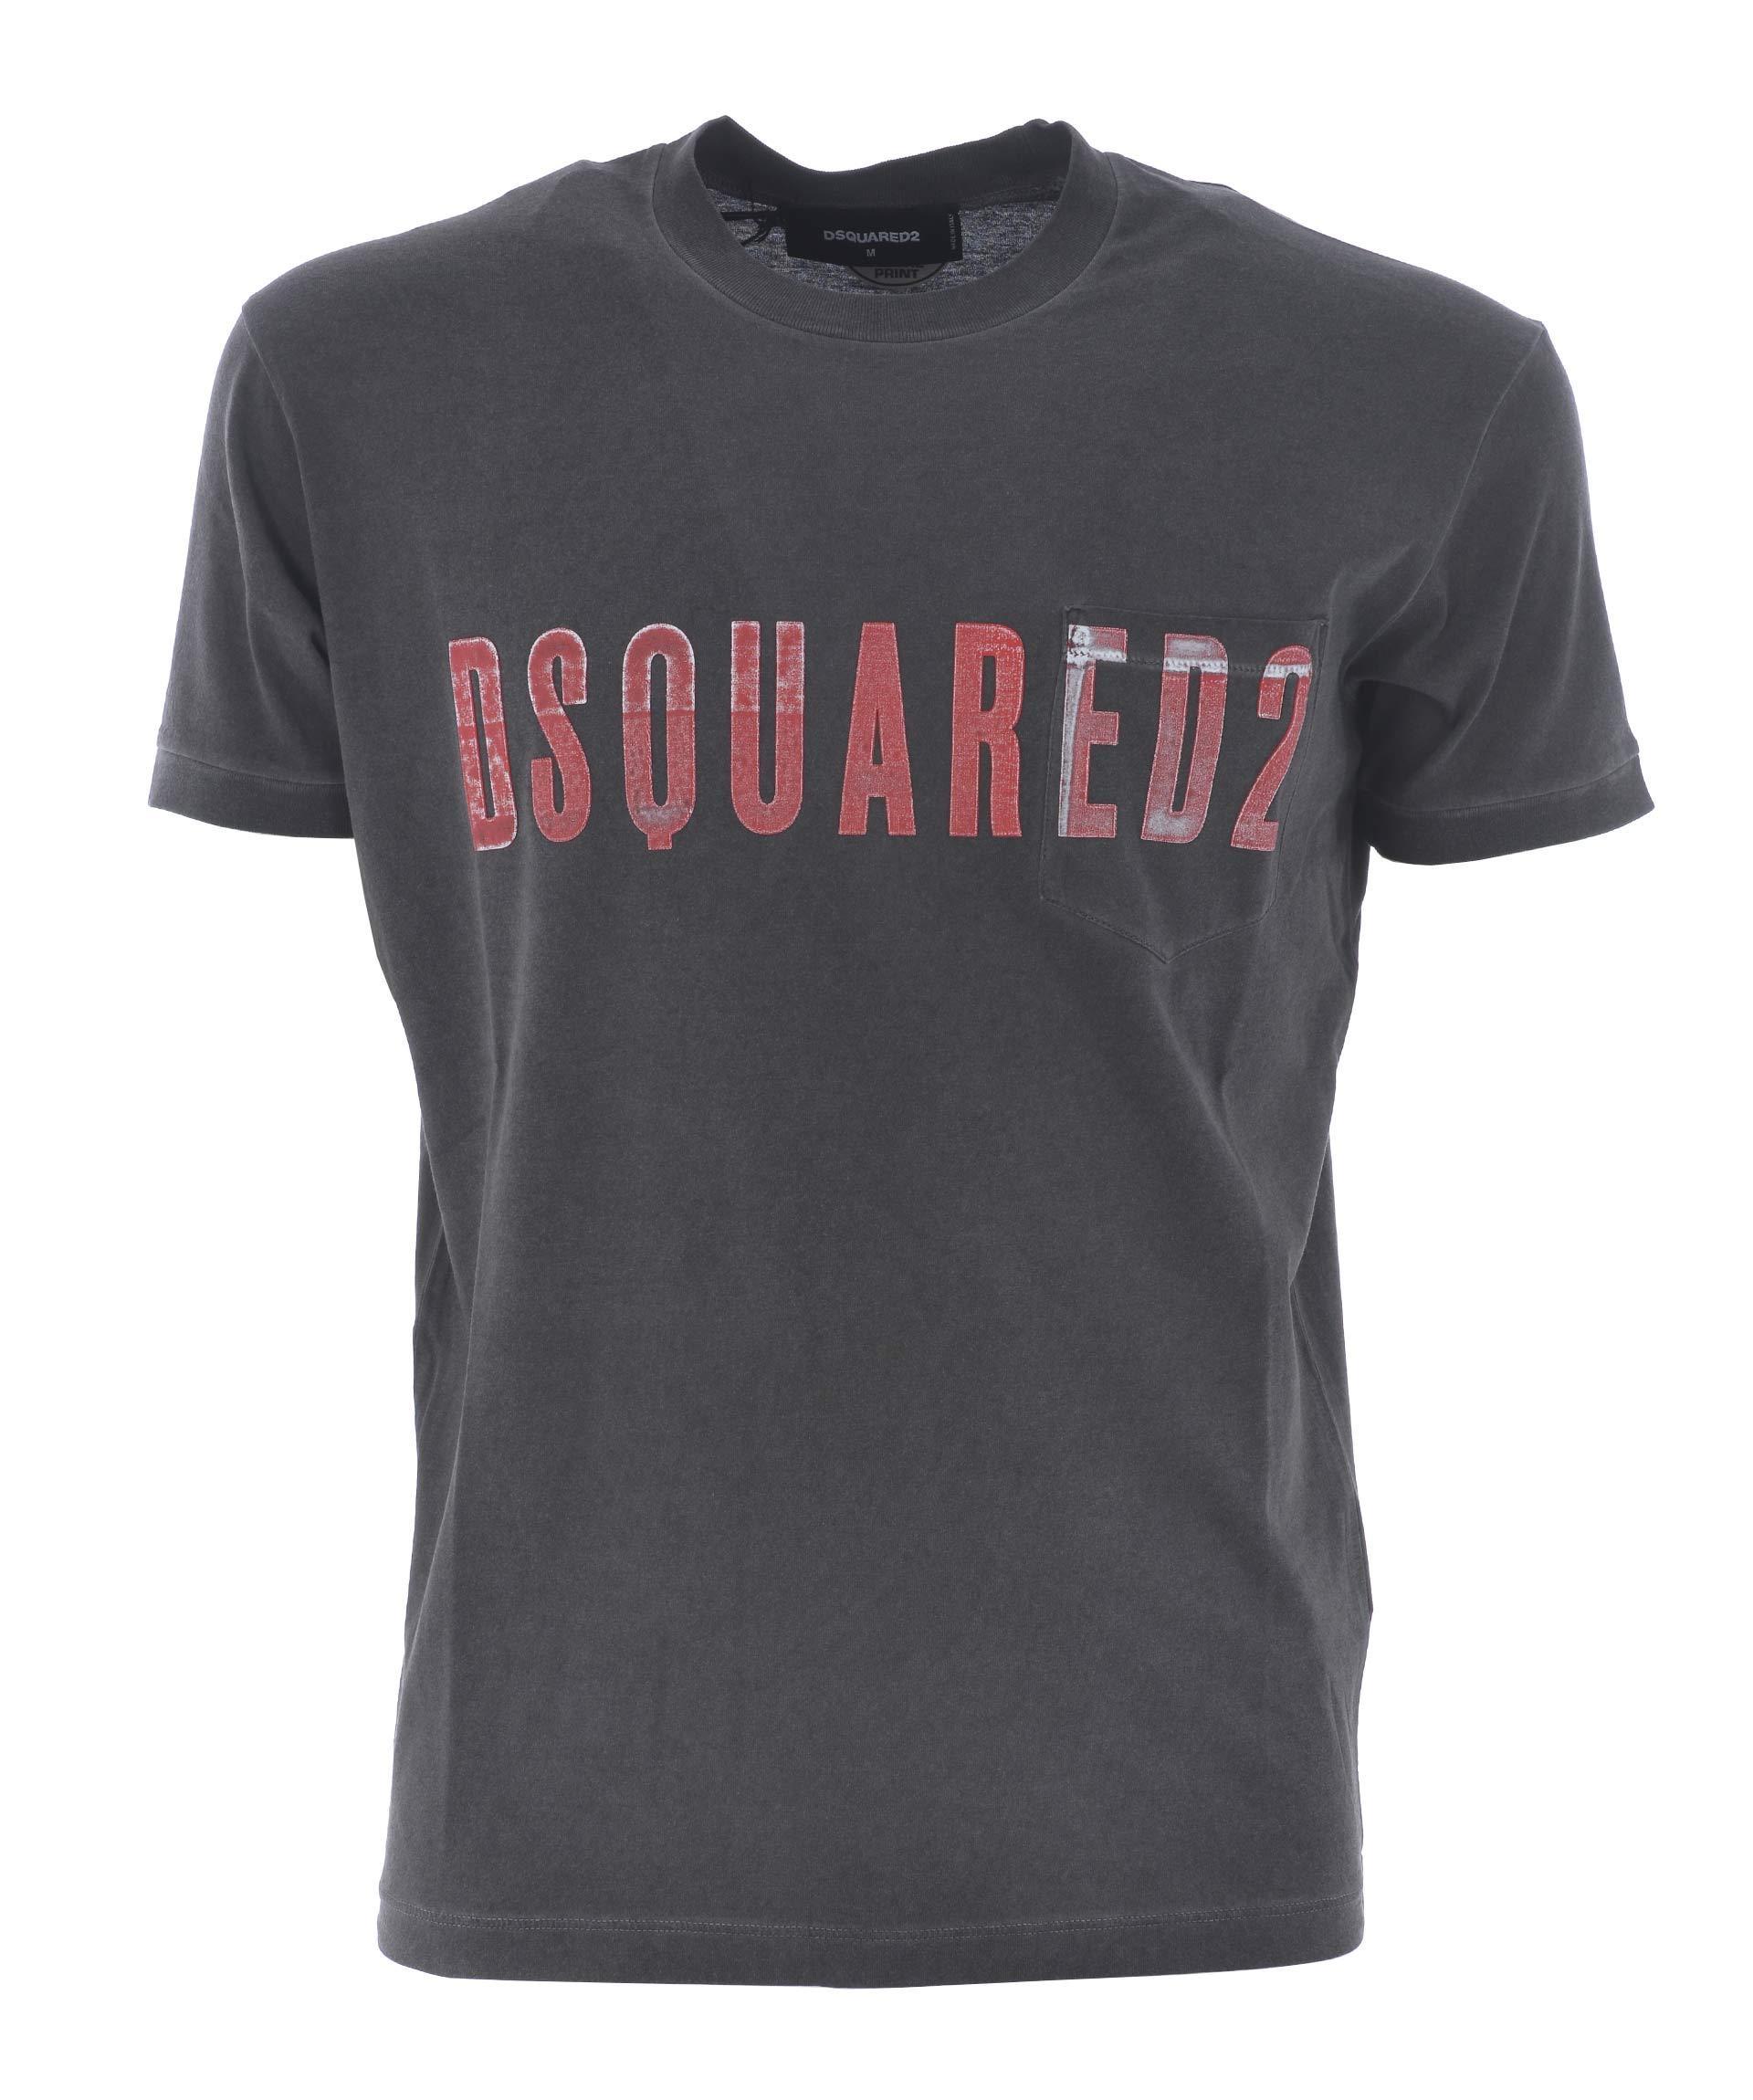 Dsquared2 Logo Printed T-Shirt In Grigio Scuro